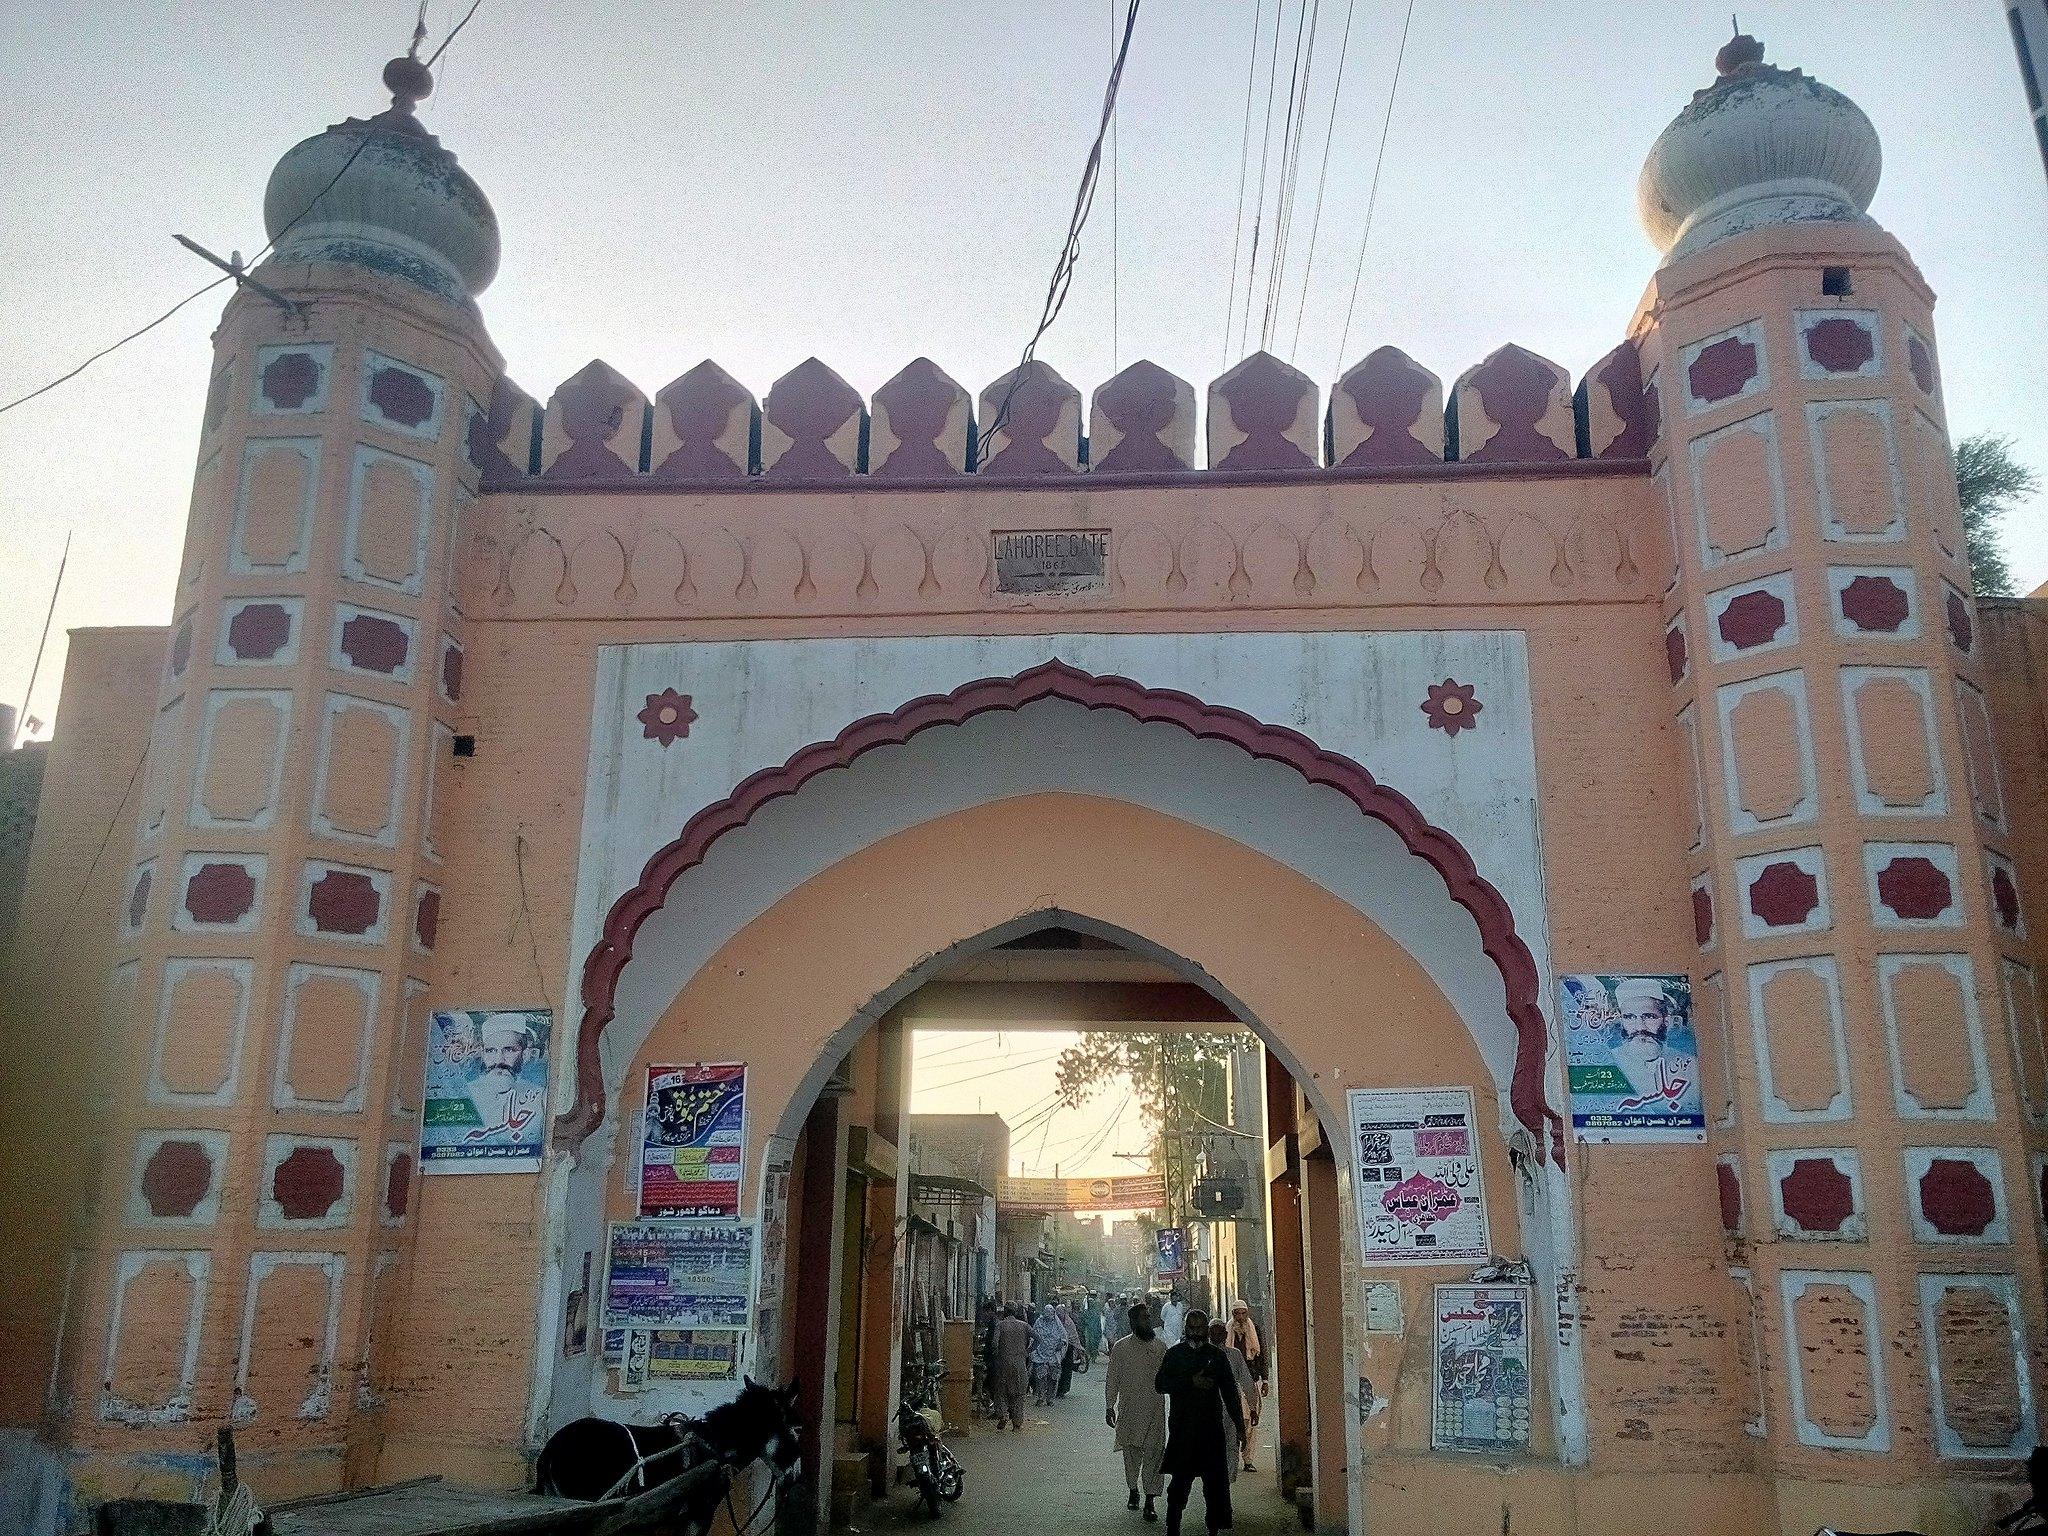 Lahoree Gate